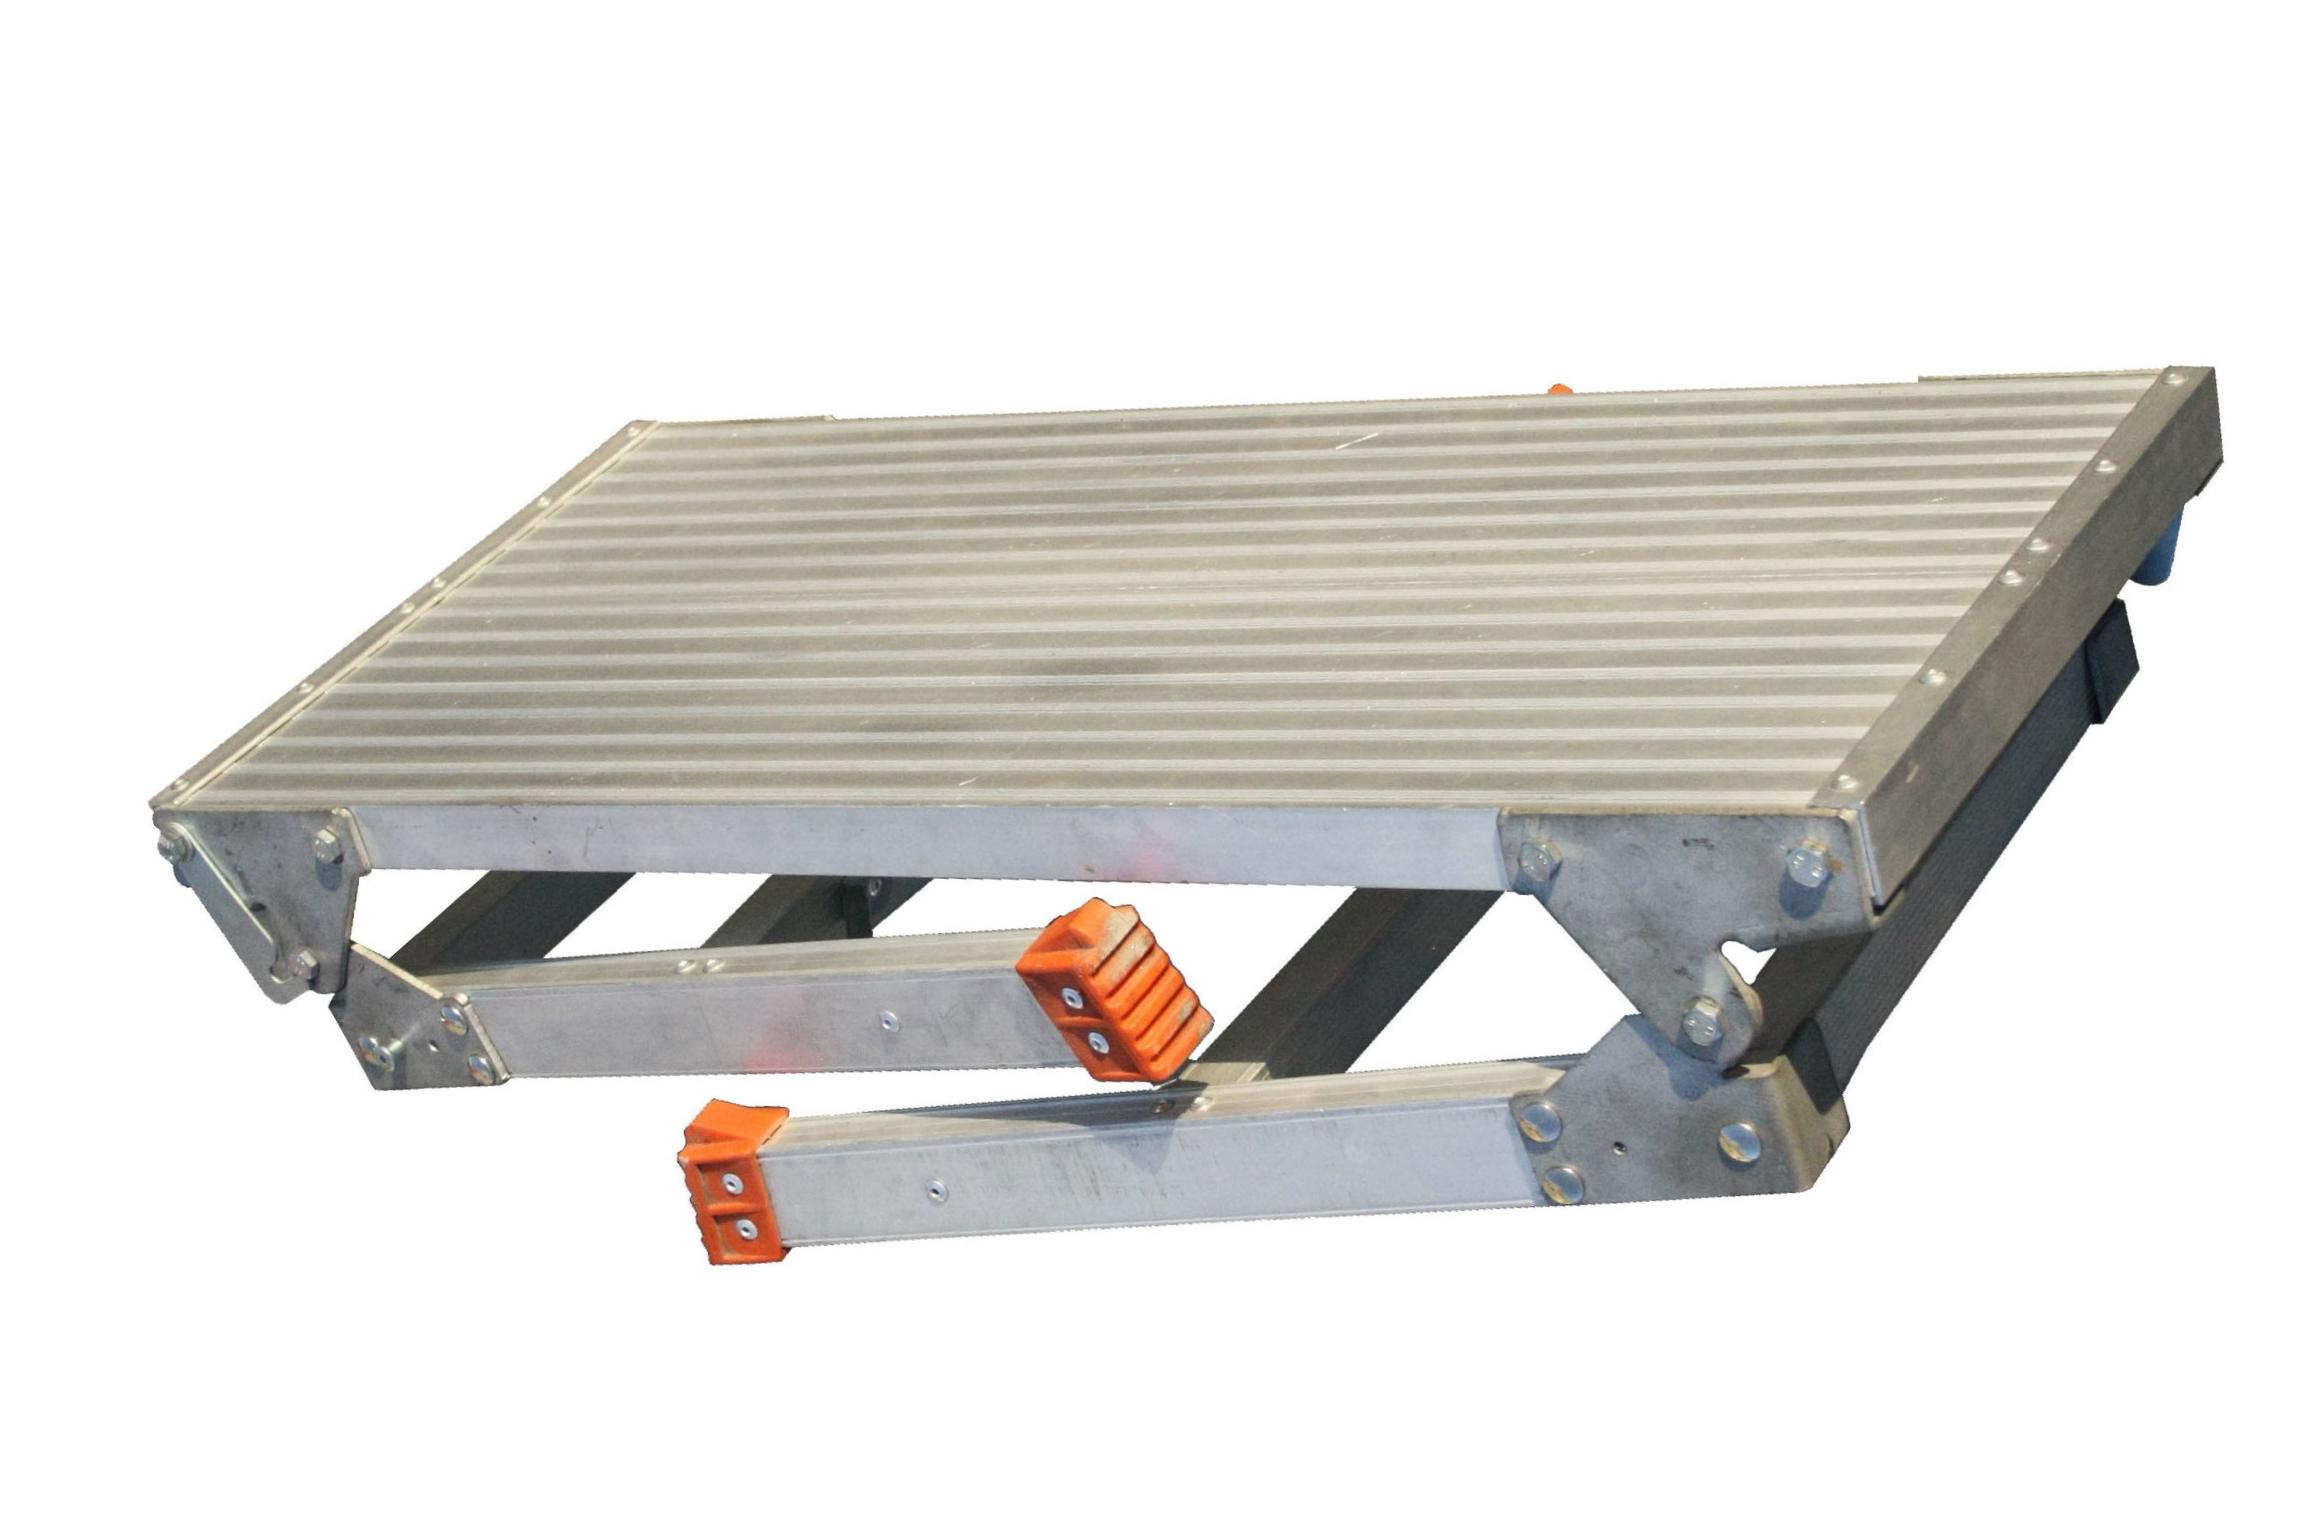 plank stool (0.5m) - folded.jpg